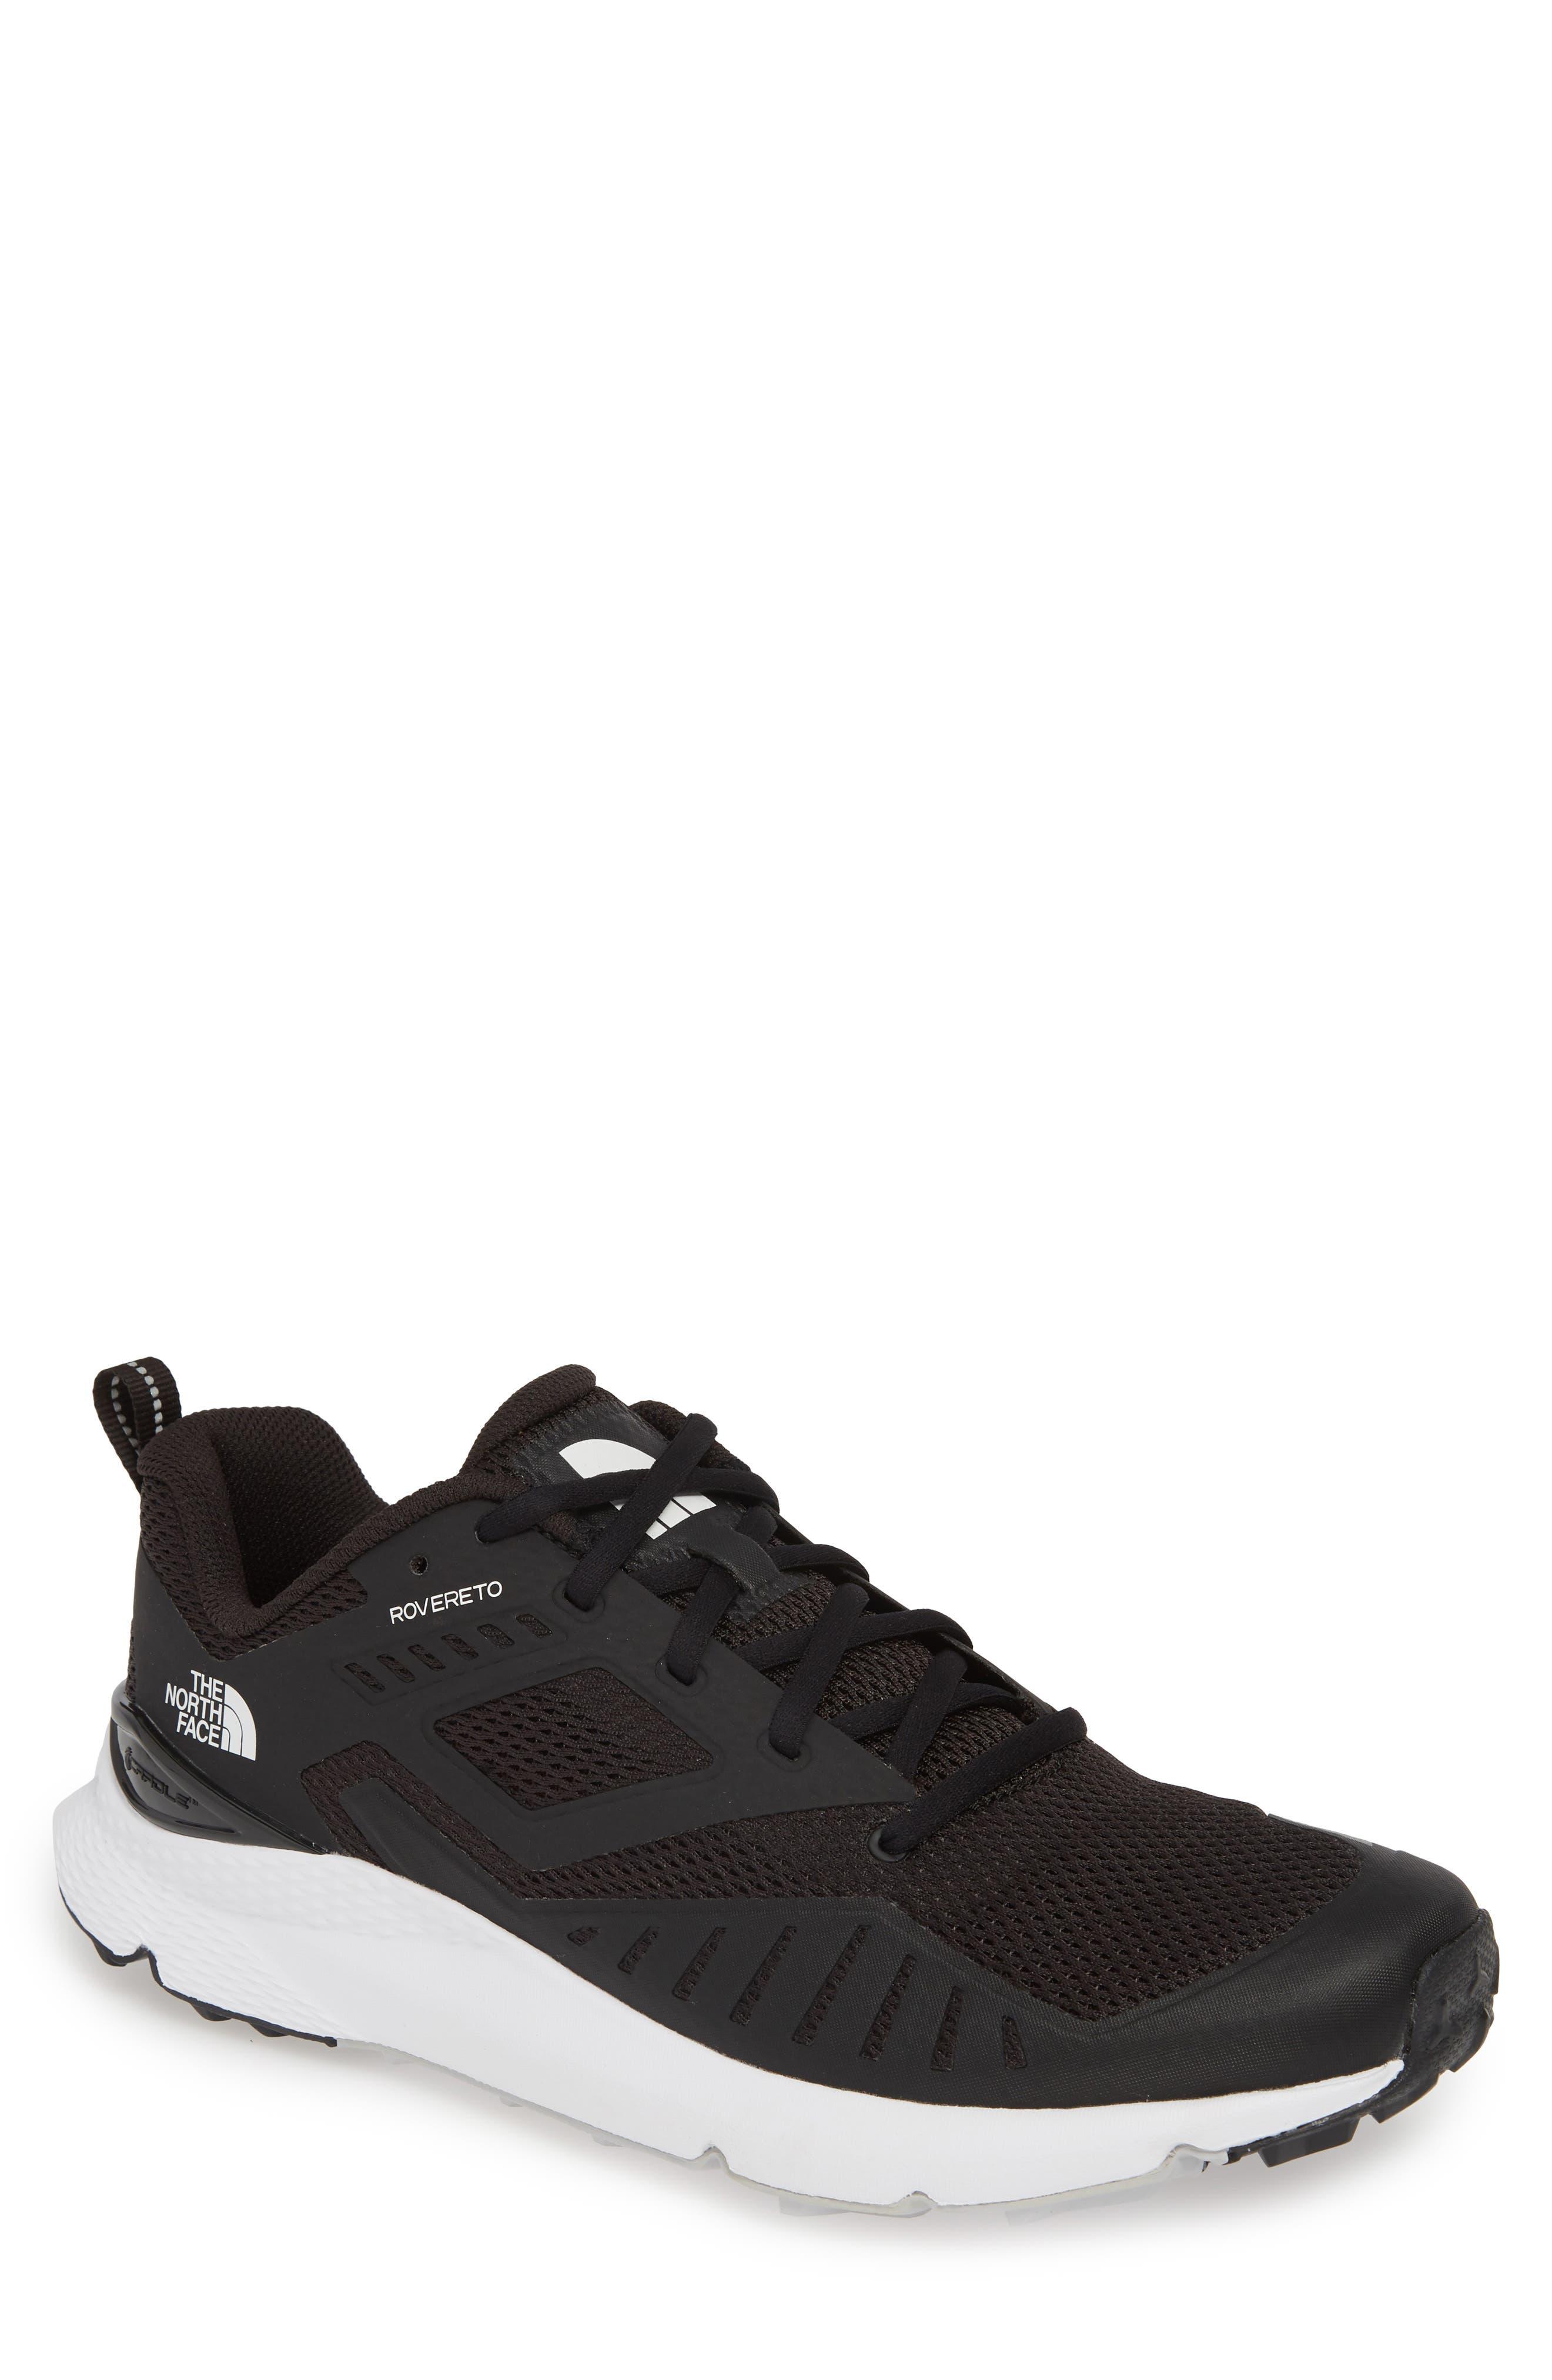 THE NORTH FACE, Rovereto Running Shoe, Main thumbnail 1, color, BLACK/ WHITE